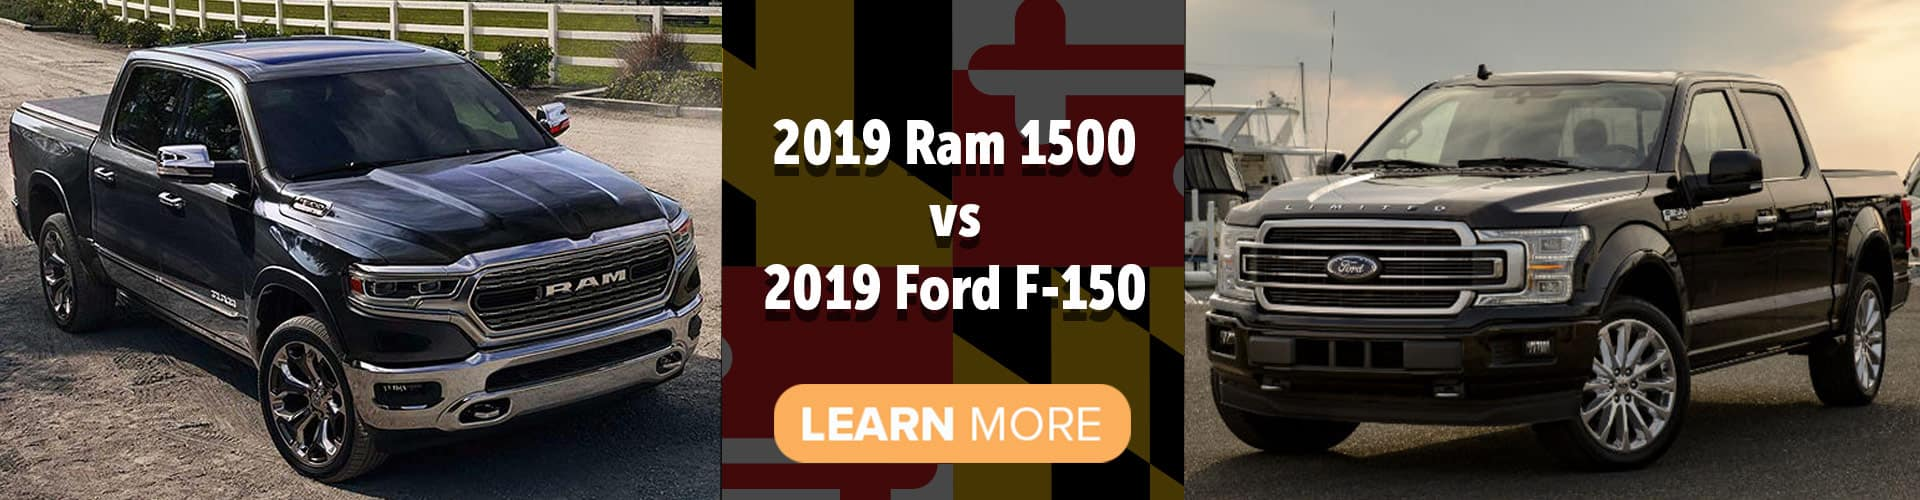 2019 Ram 1500 v. 2019 Ford F-150